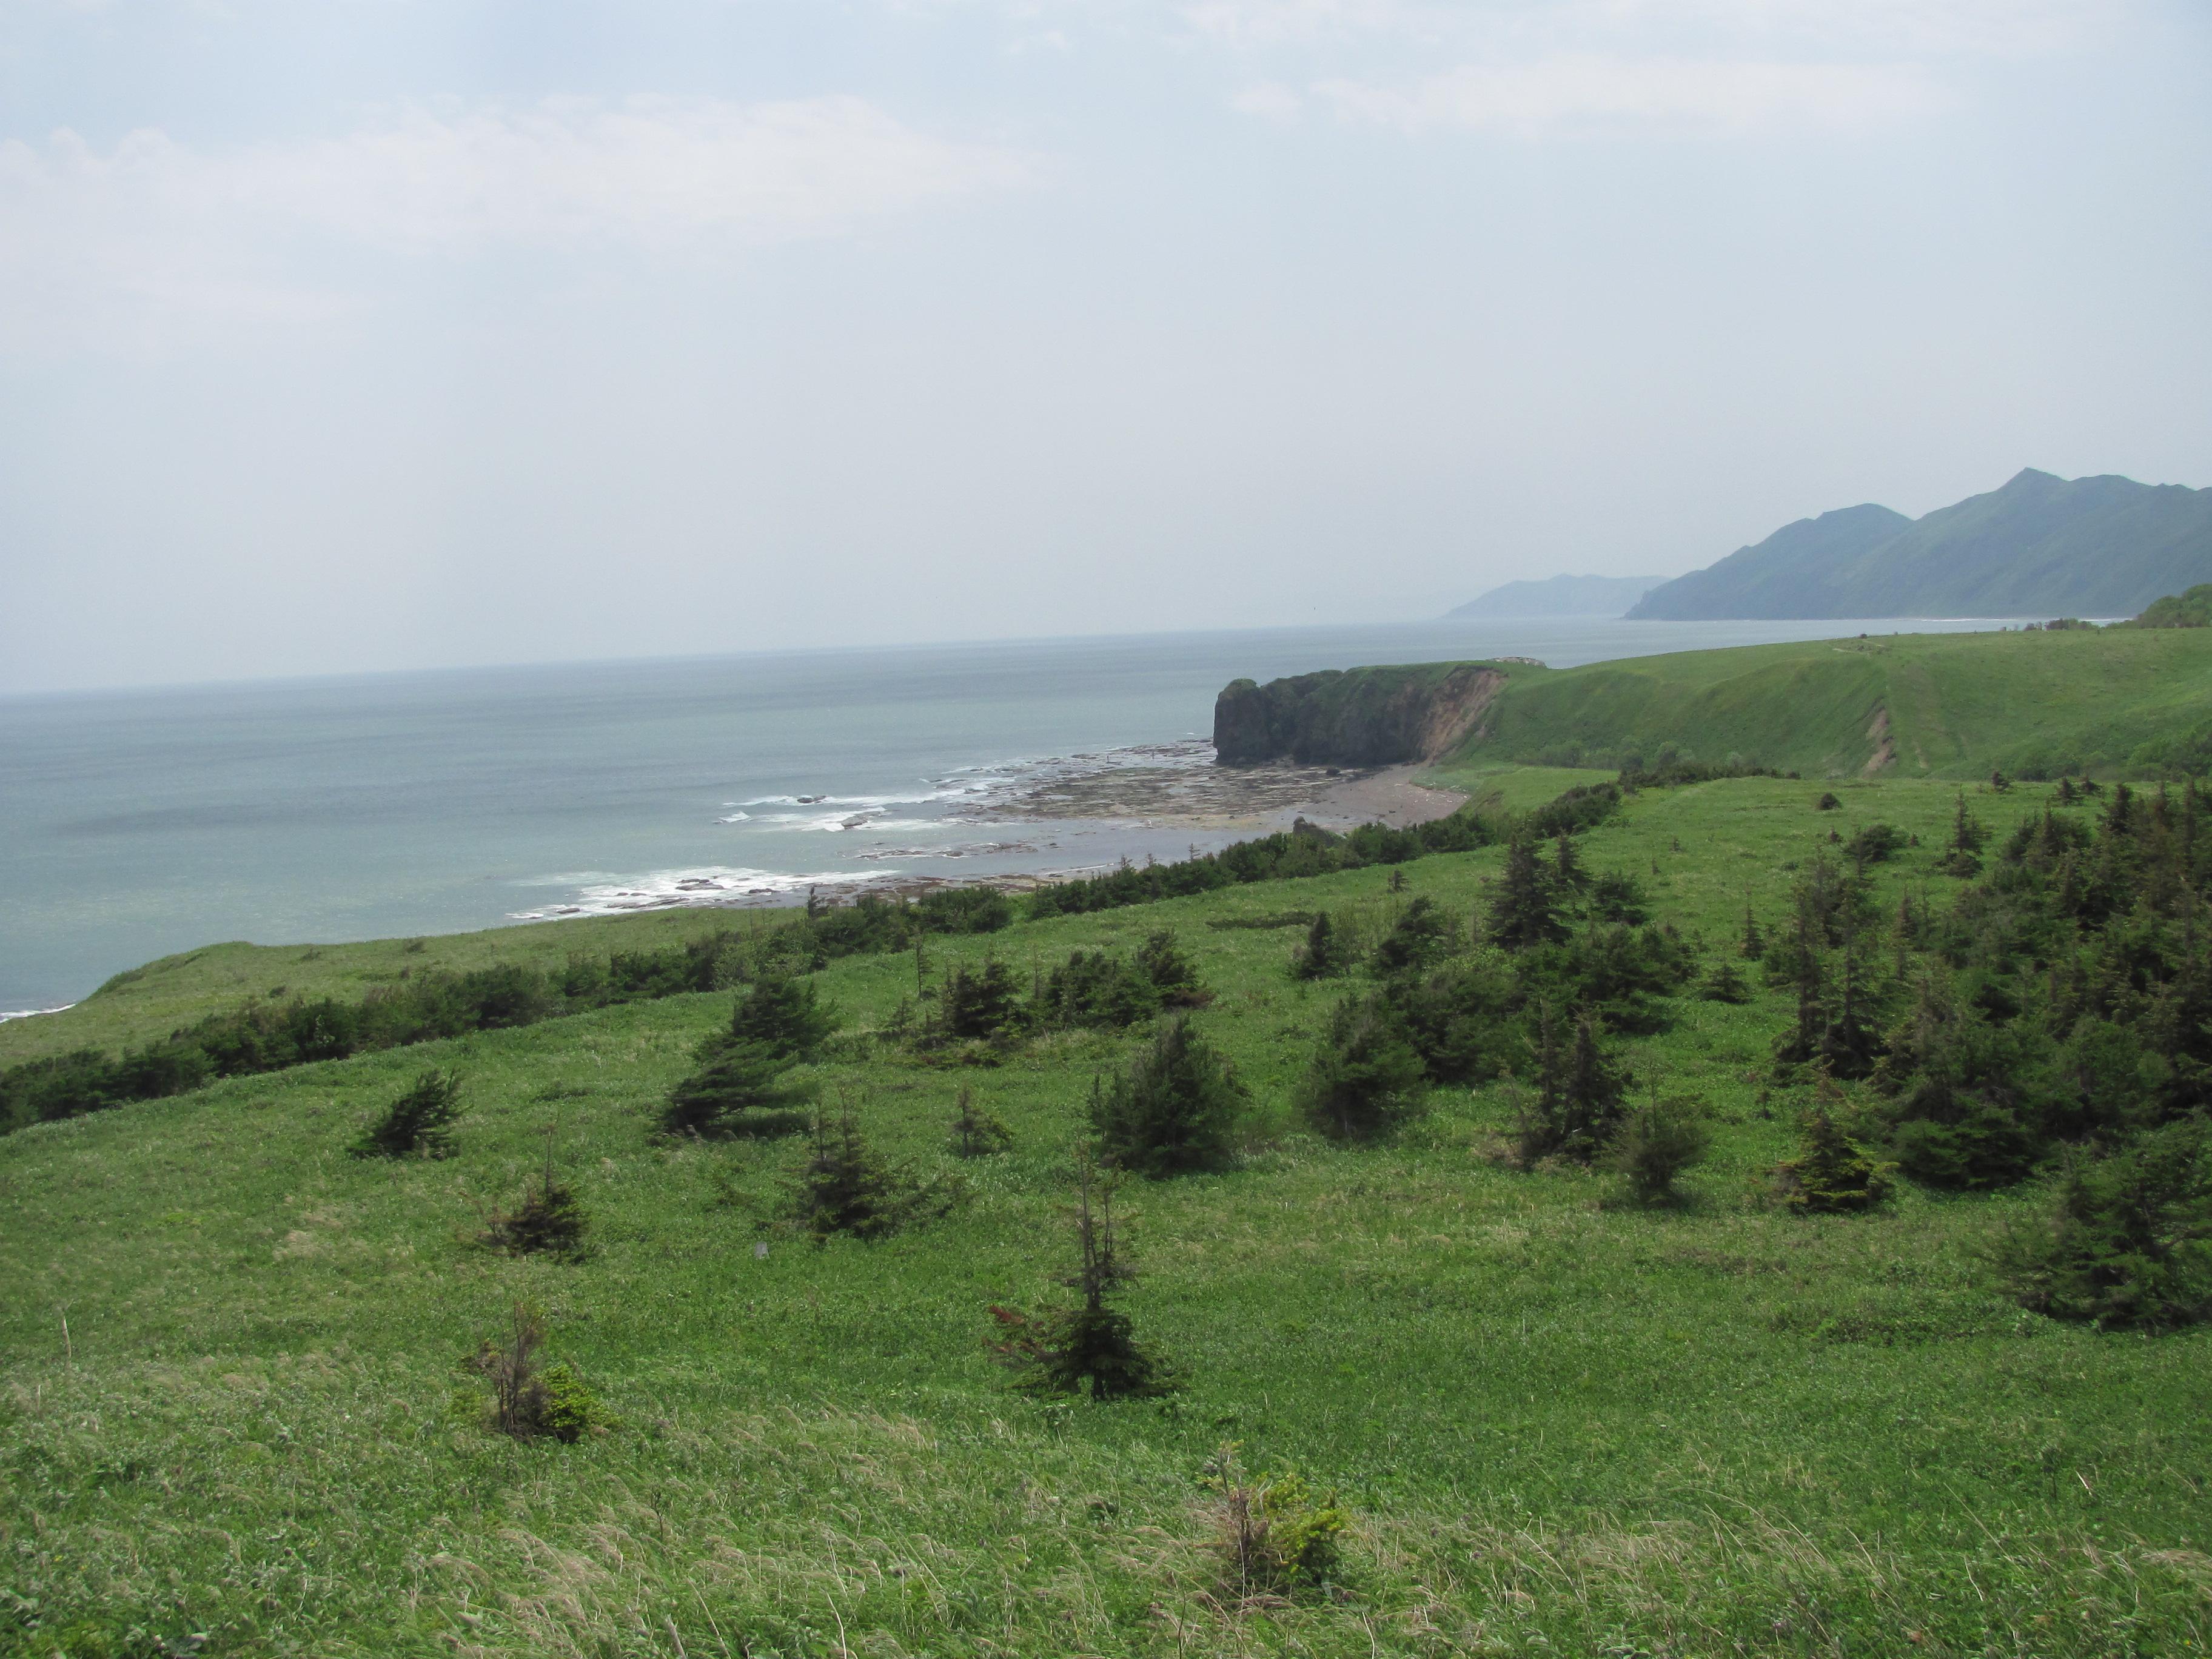 Cape Tihii. Sakhalin coast of Sea of Okhotsk.JPG